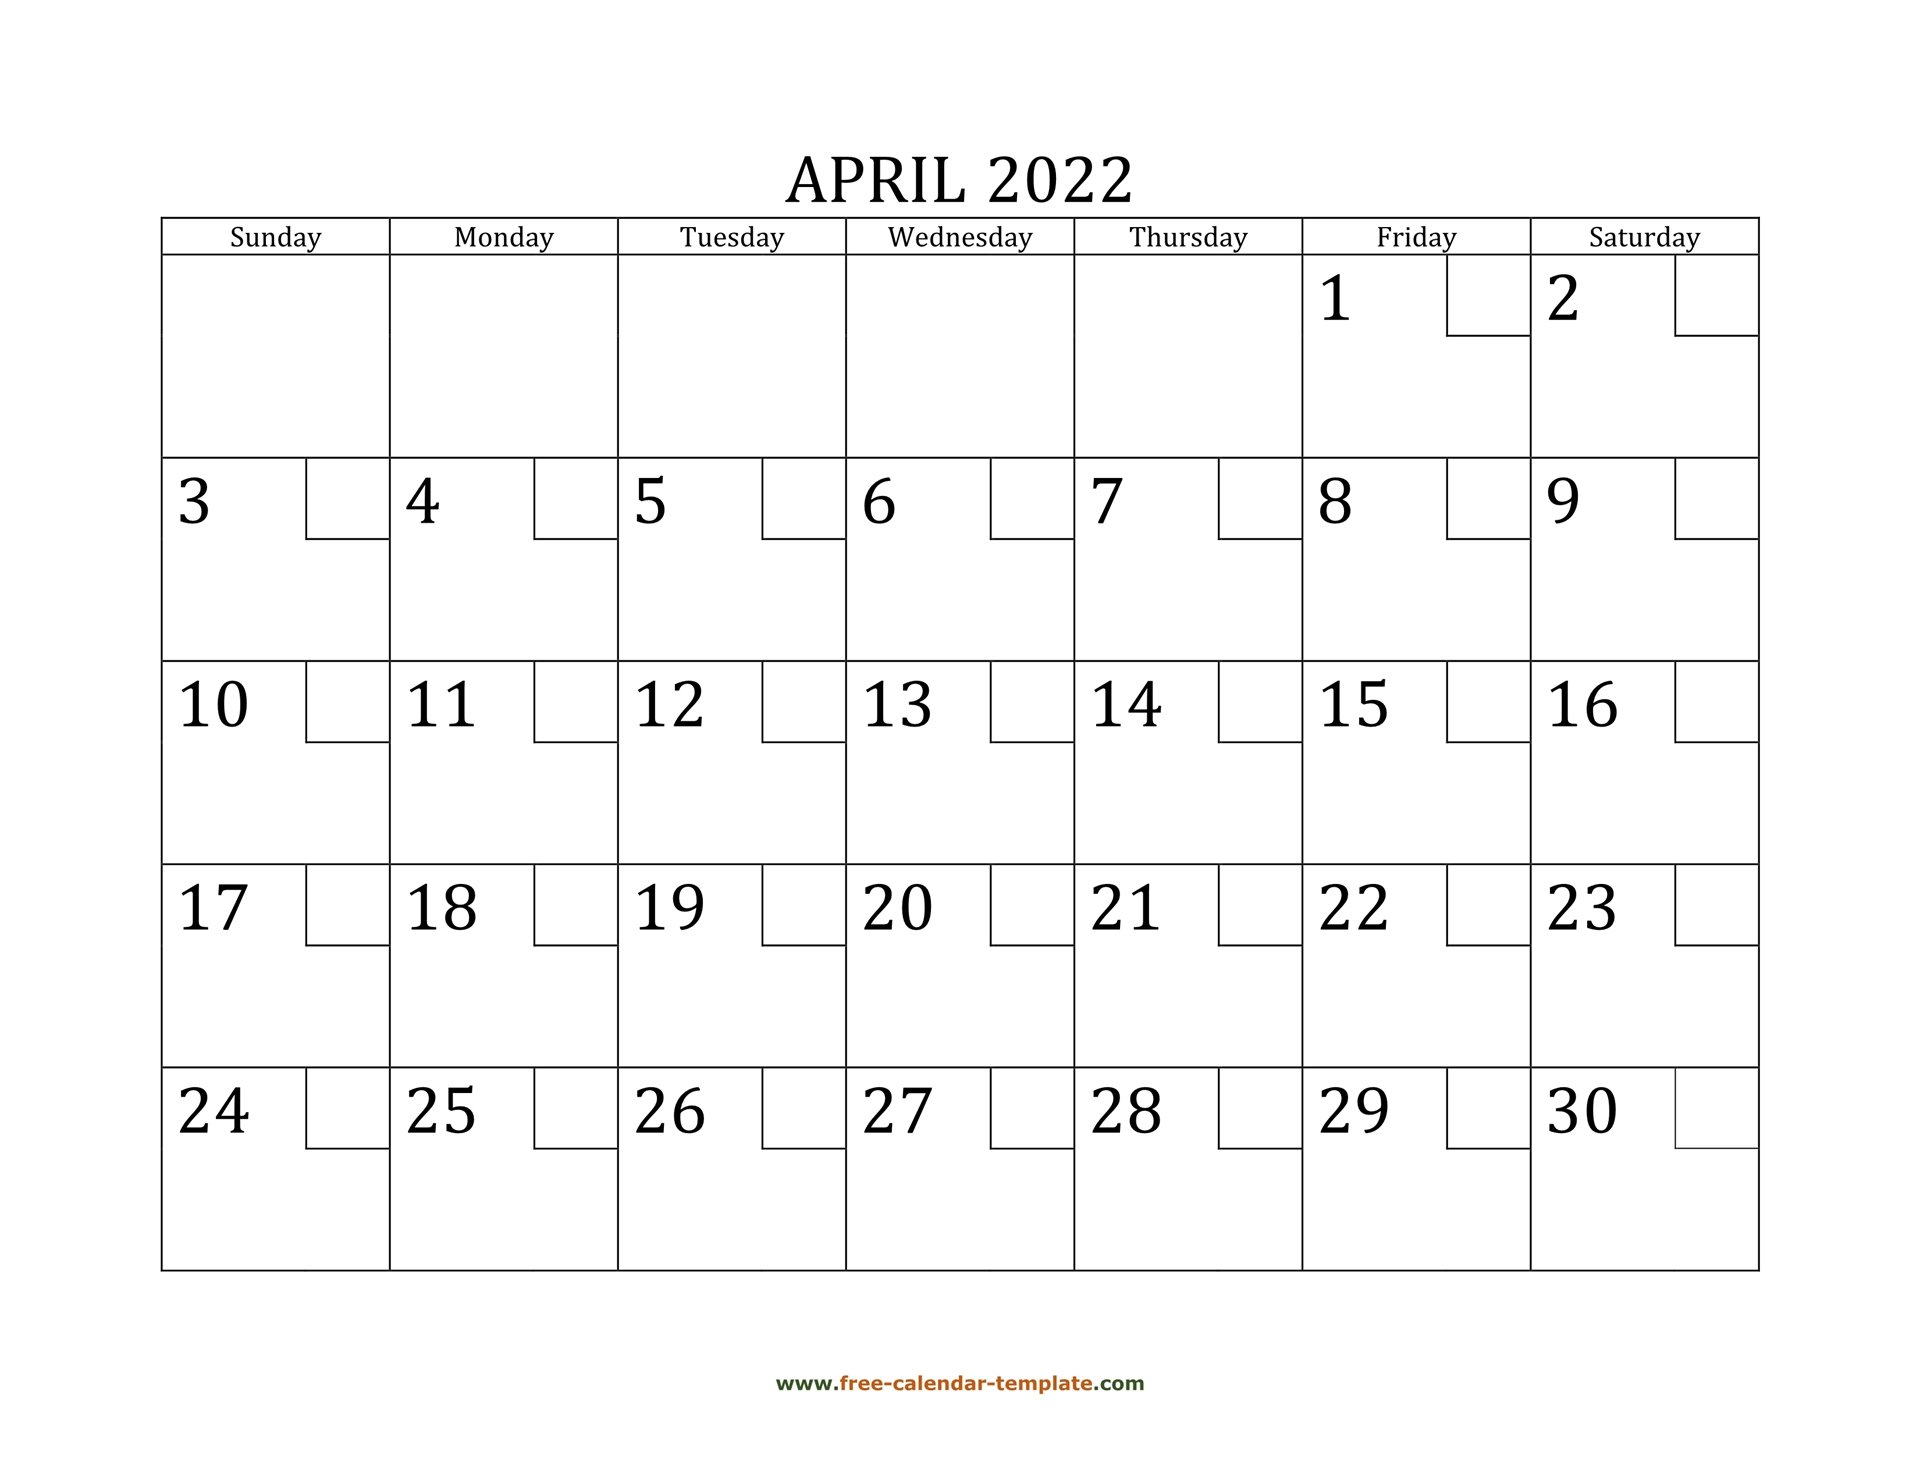 April 2022 Free Calendar Tempplate | Free-Calendar throughout Printable April 2022 Calendar Template Free